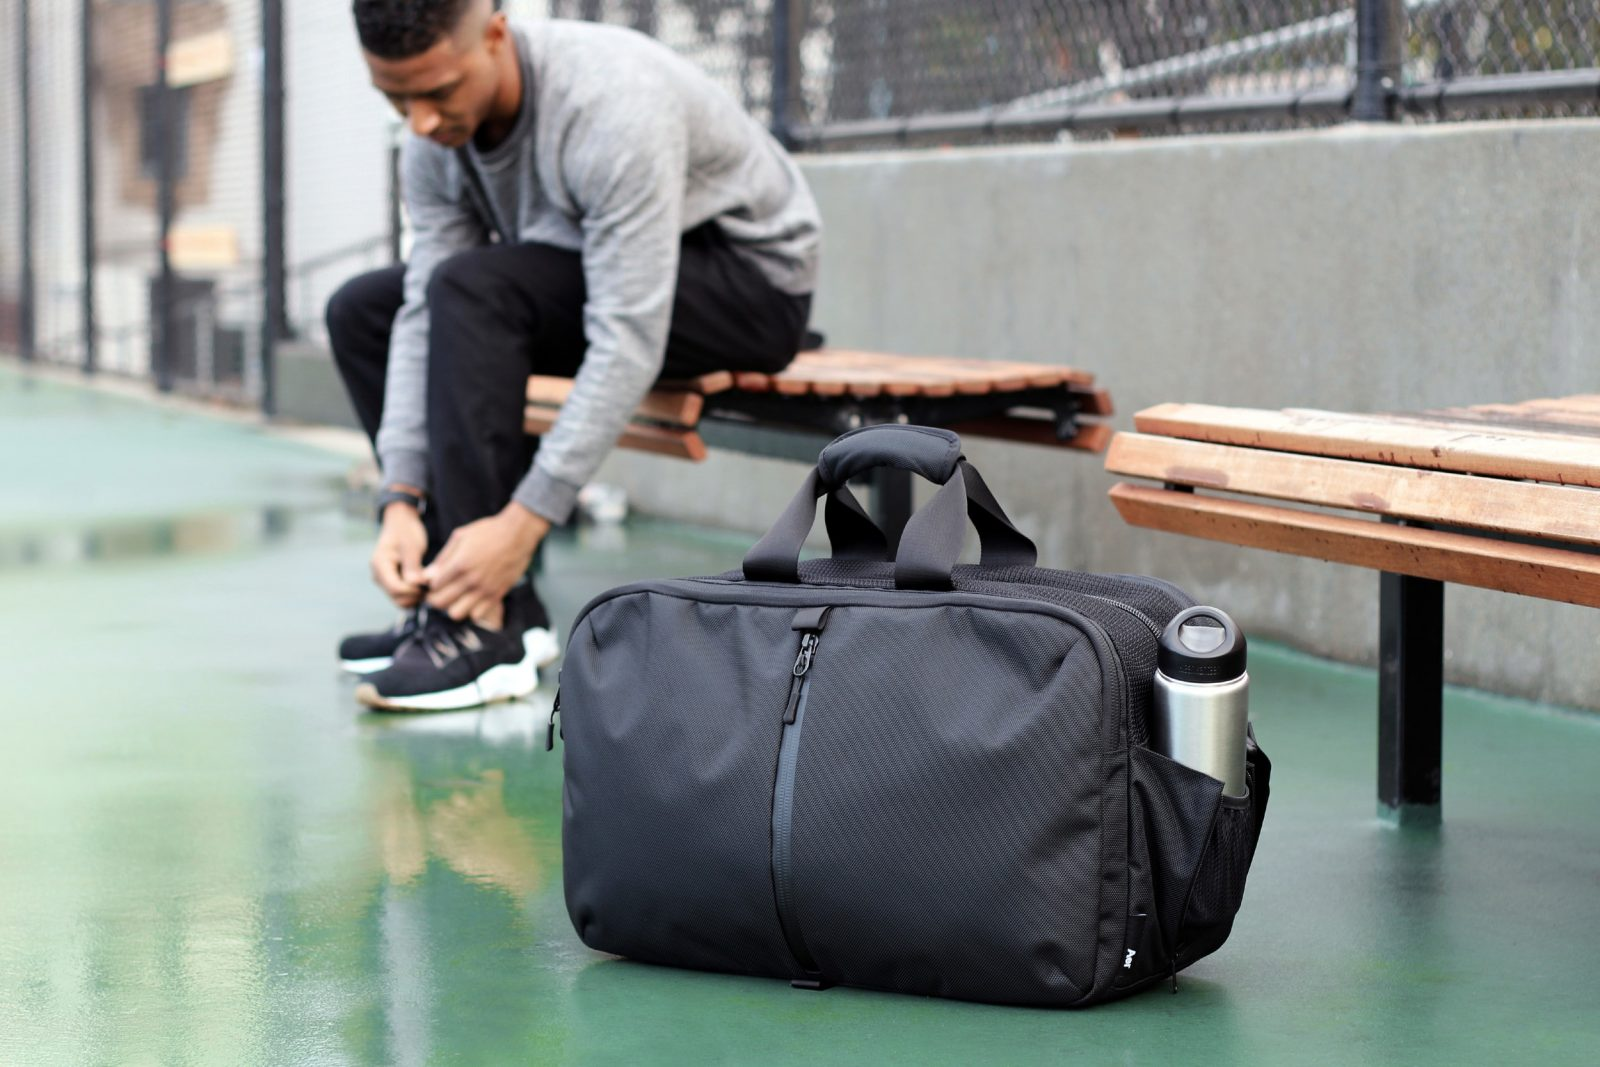 Спортивная сумка на фоне атлета, который завязывает шнурки, сидя на лавочке